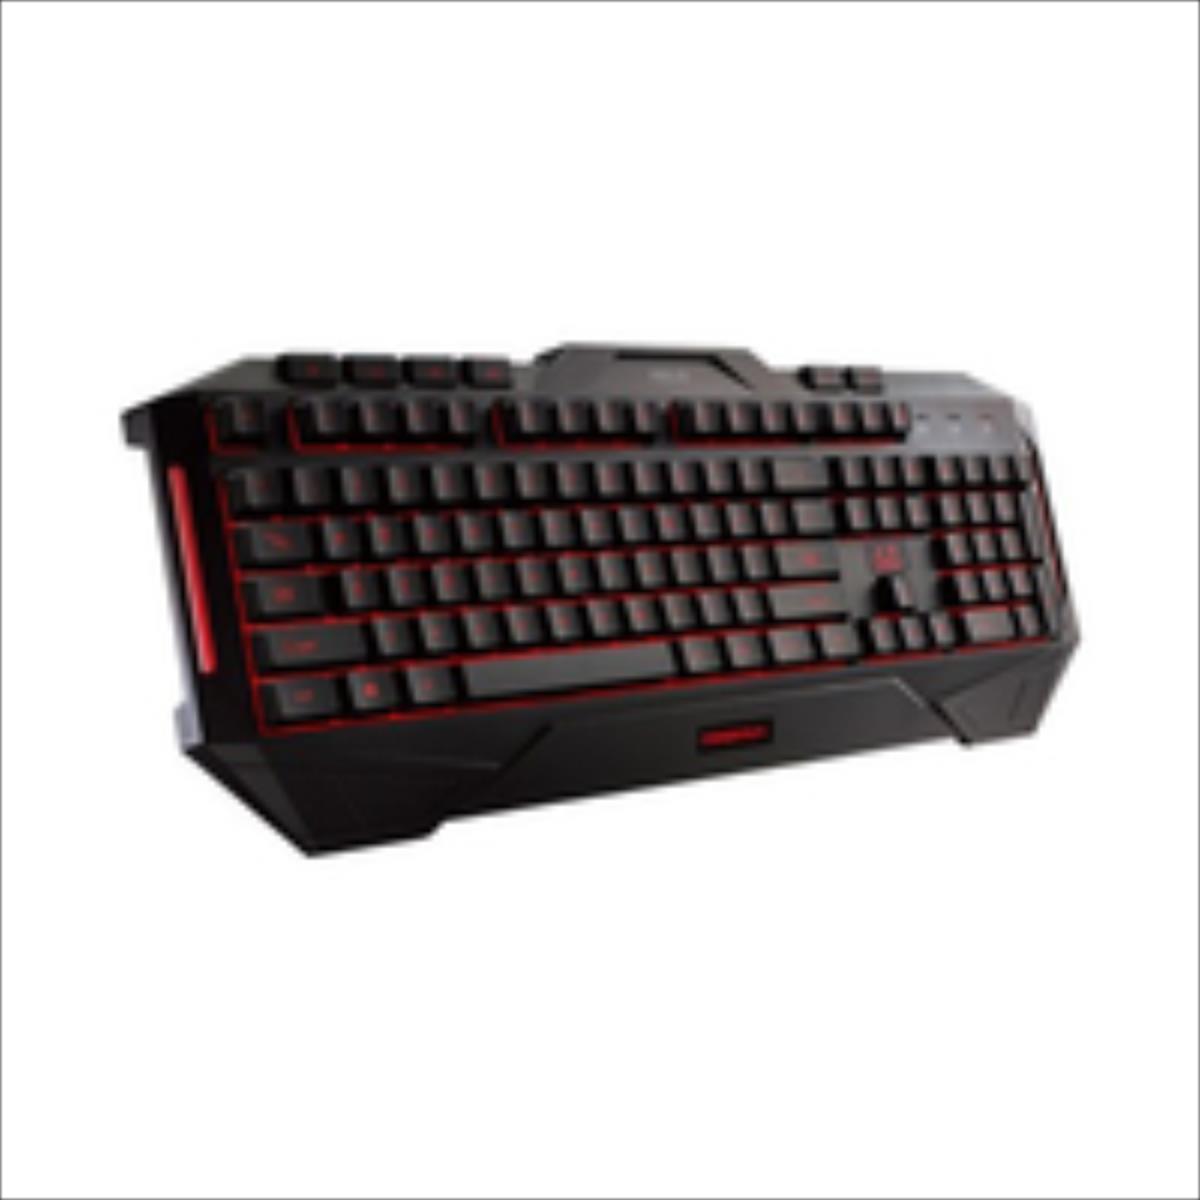 ASUS Cerberus Gaming Keyboard - DE-Layout QWERTZ klaviatūra